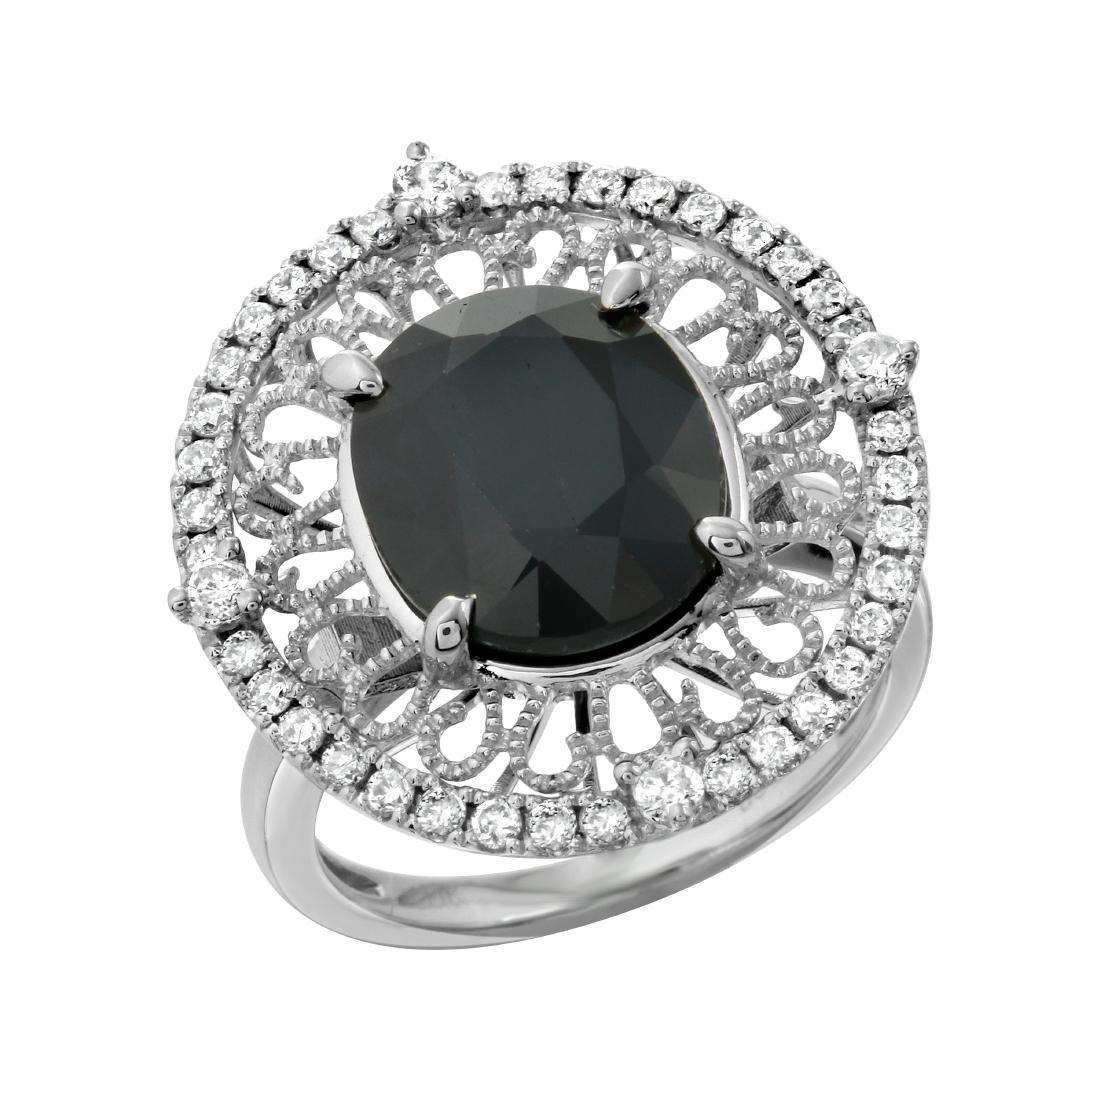 0.59 CTW Diamond Semi Mount  Ring in 14K White Gold